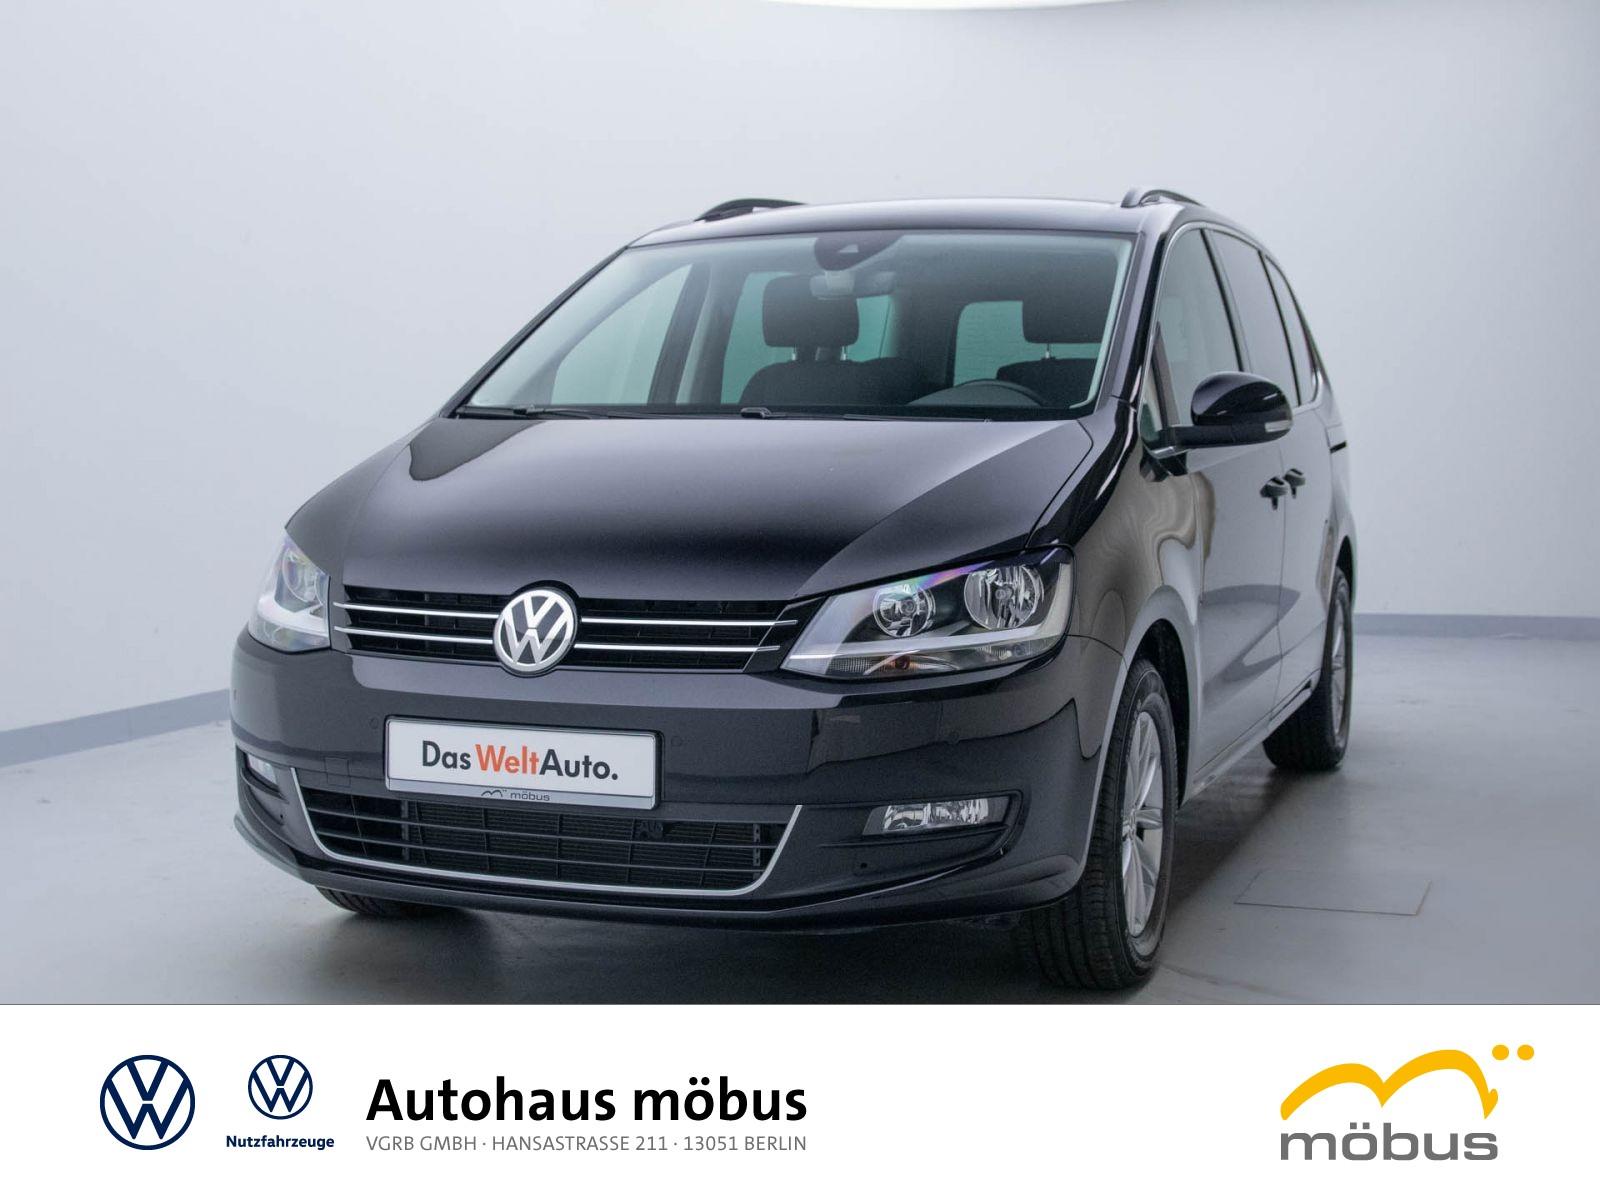 Volkswagen Sharan 1.4 TSI DSG*COMFORTL*NAVI*BLIND SPOT*RFK*, Jahr 2019, Benzin